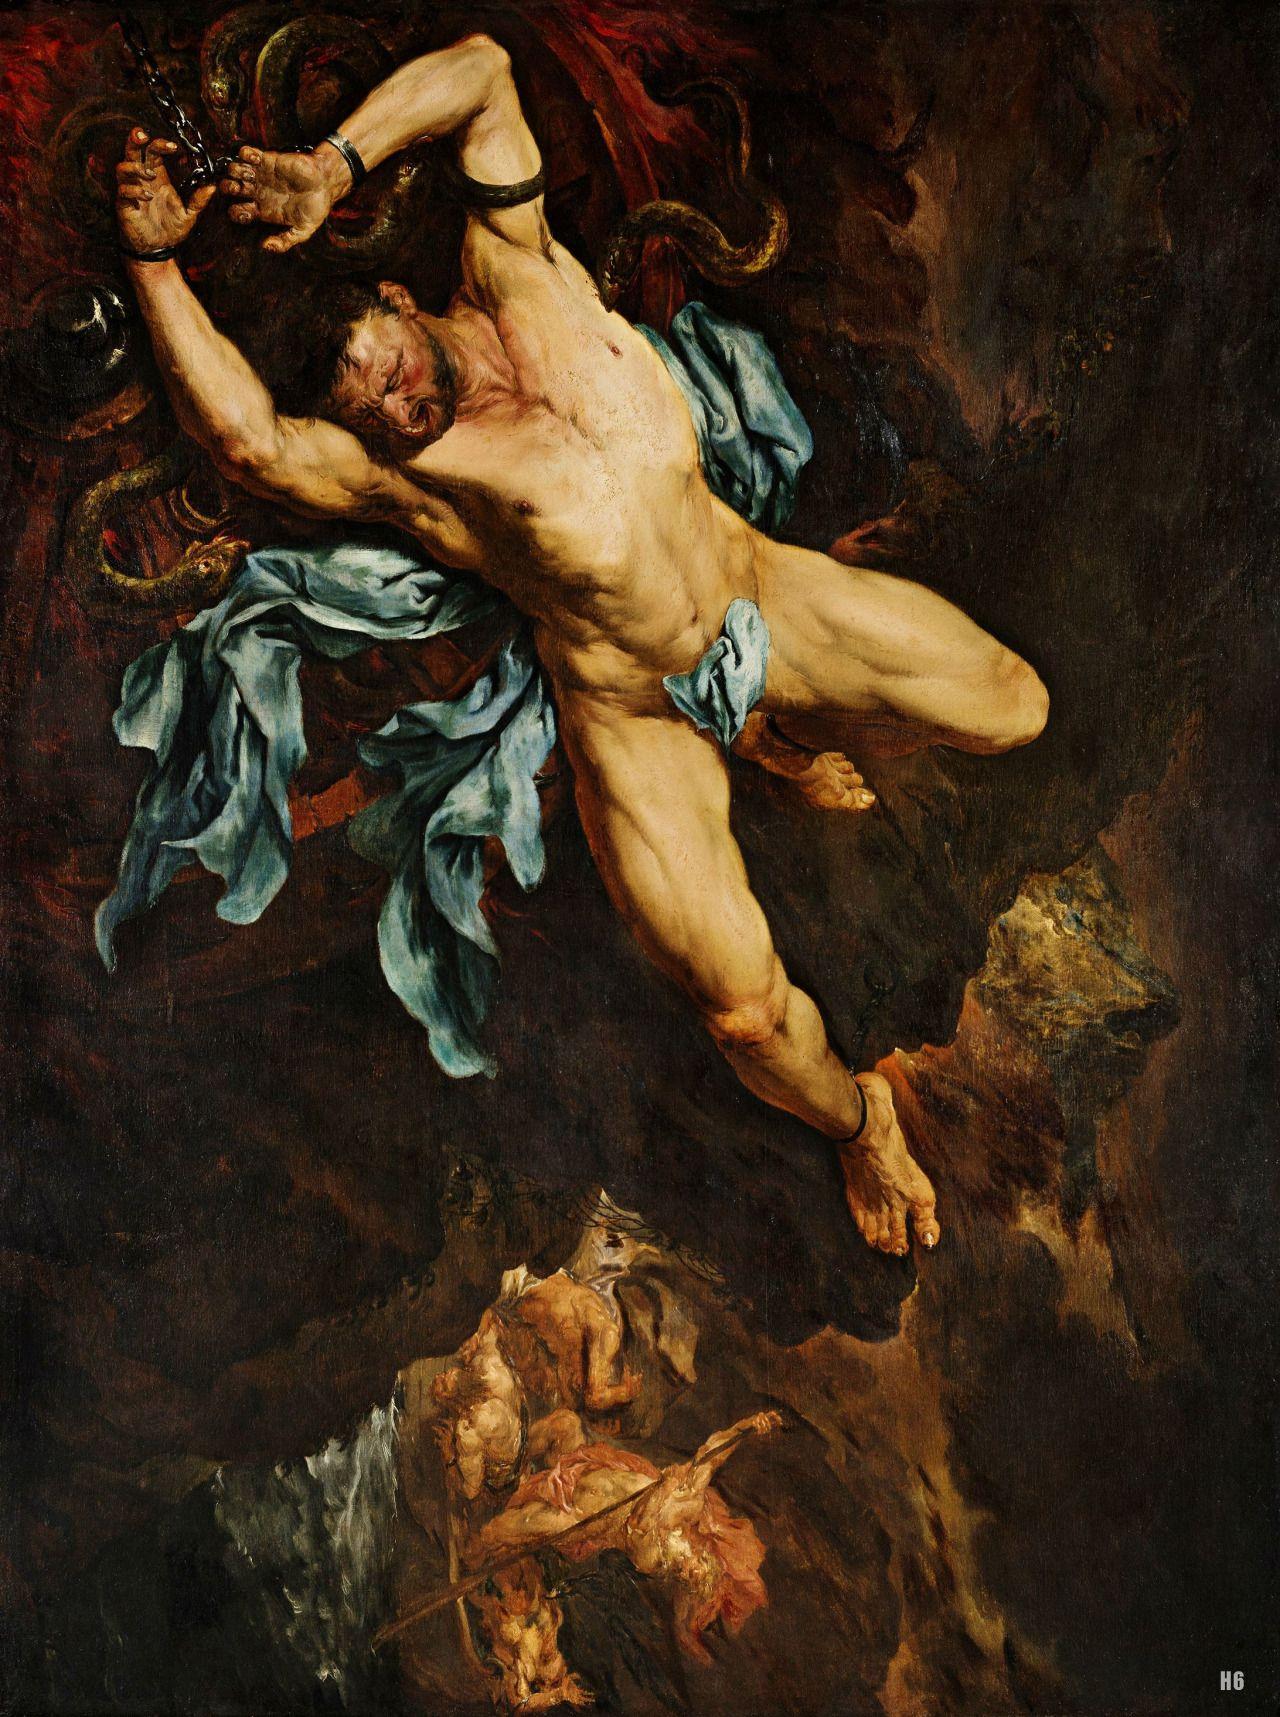 17th century gay art